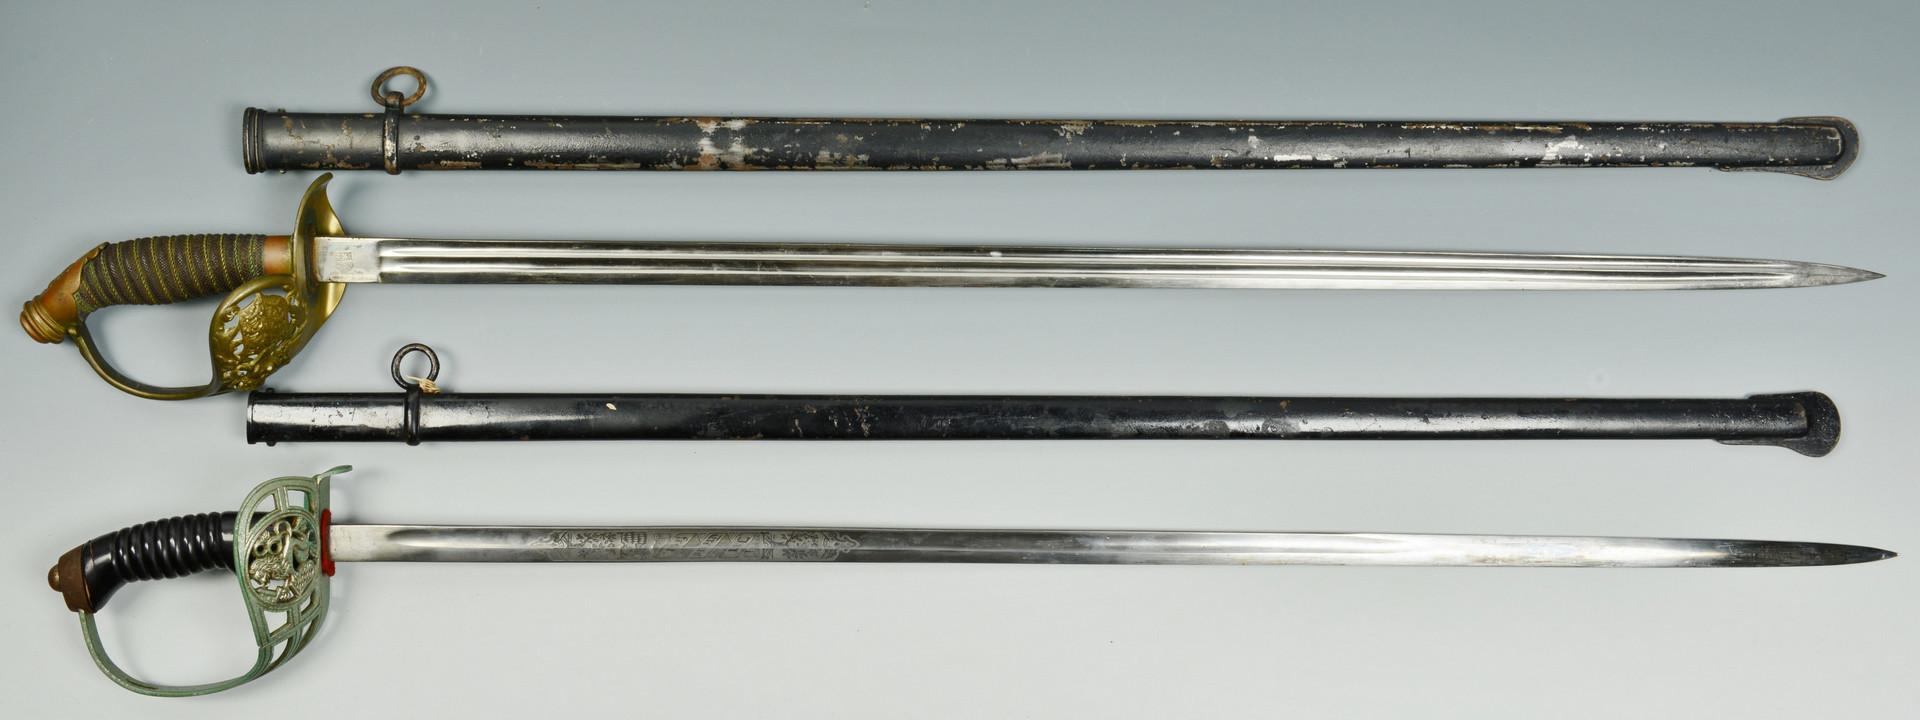 Lot 405: 3 German WWI & WWII Swords